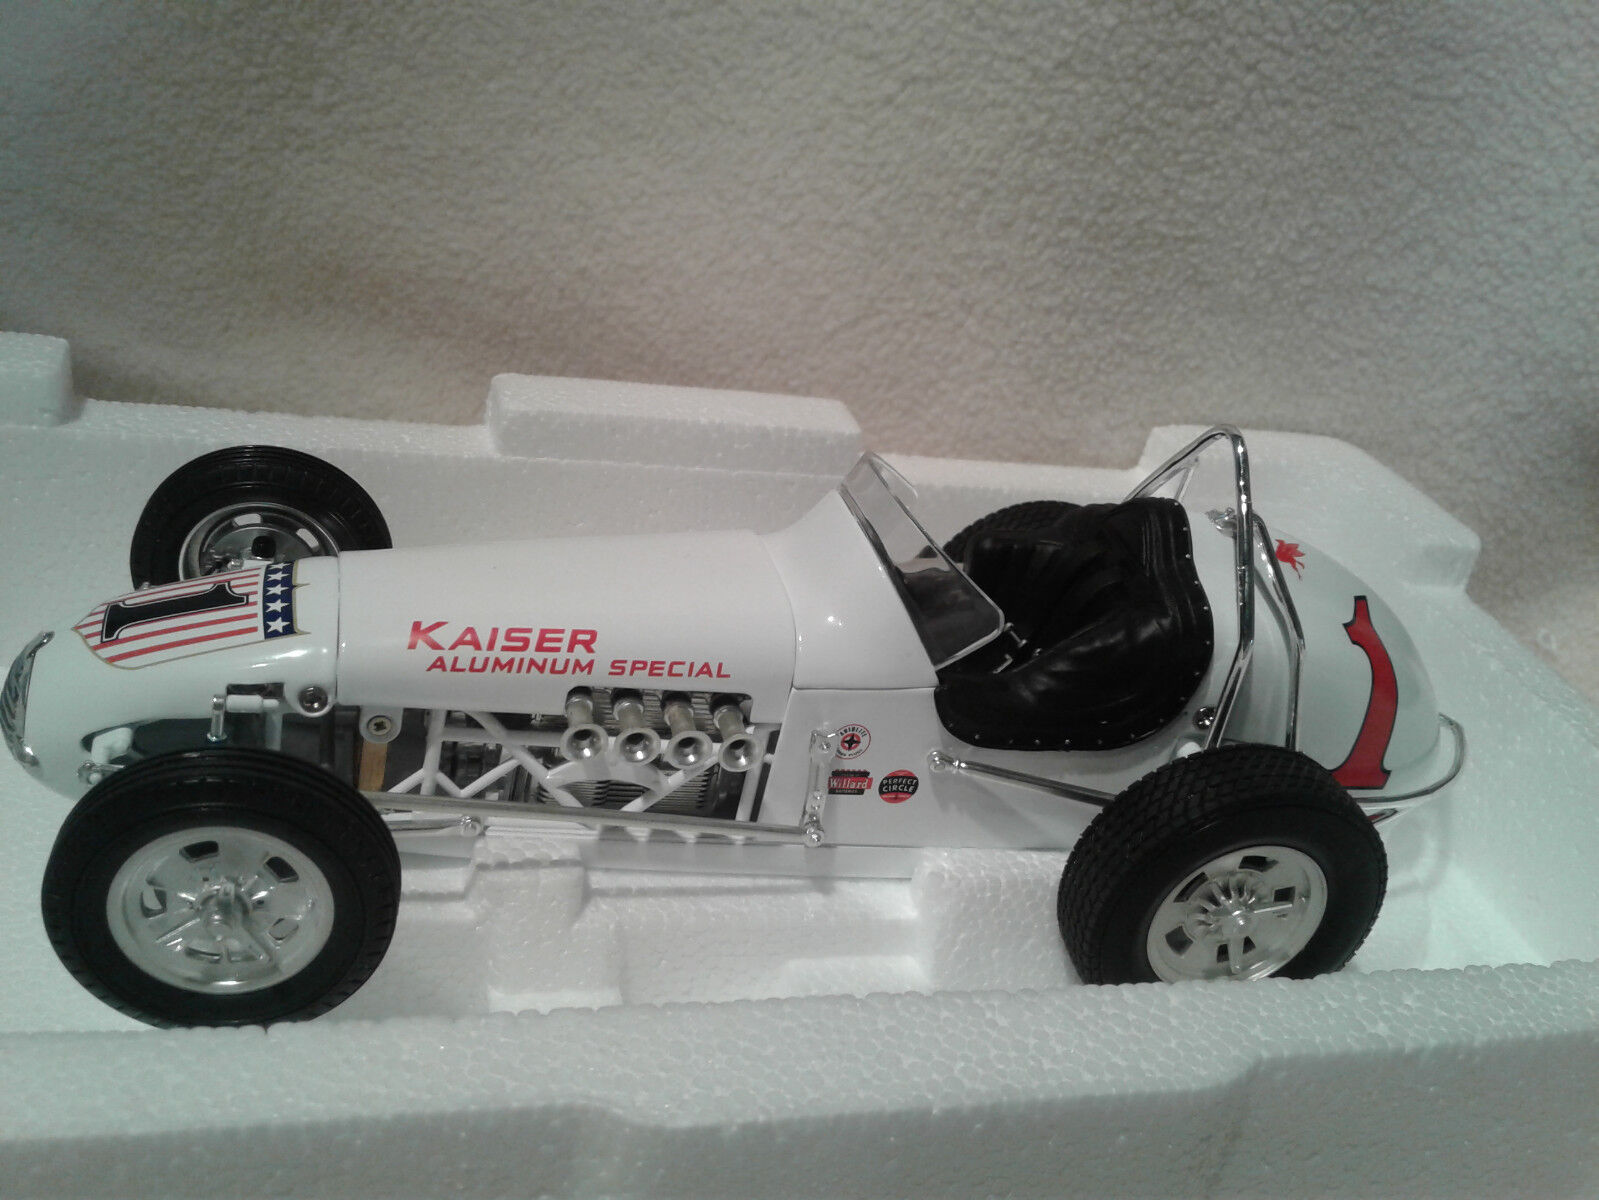 GMP 7621 RODGER WARD No.1 Kaiser aluminium spécial Dirt Champ 1 18